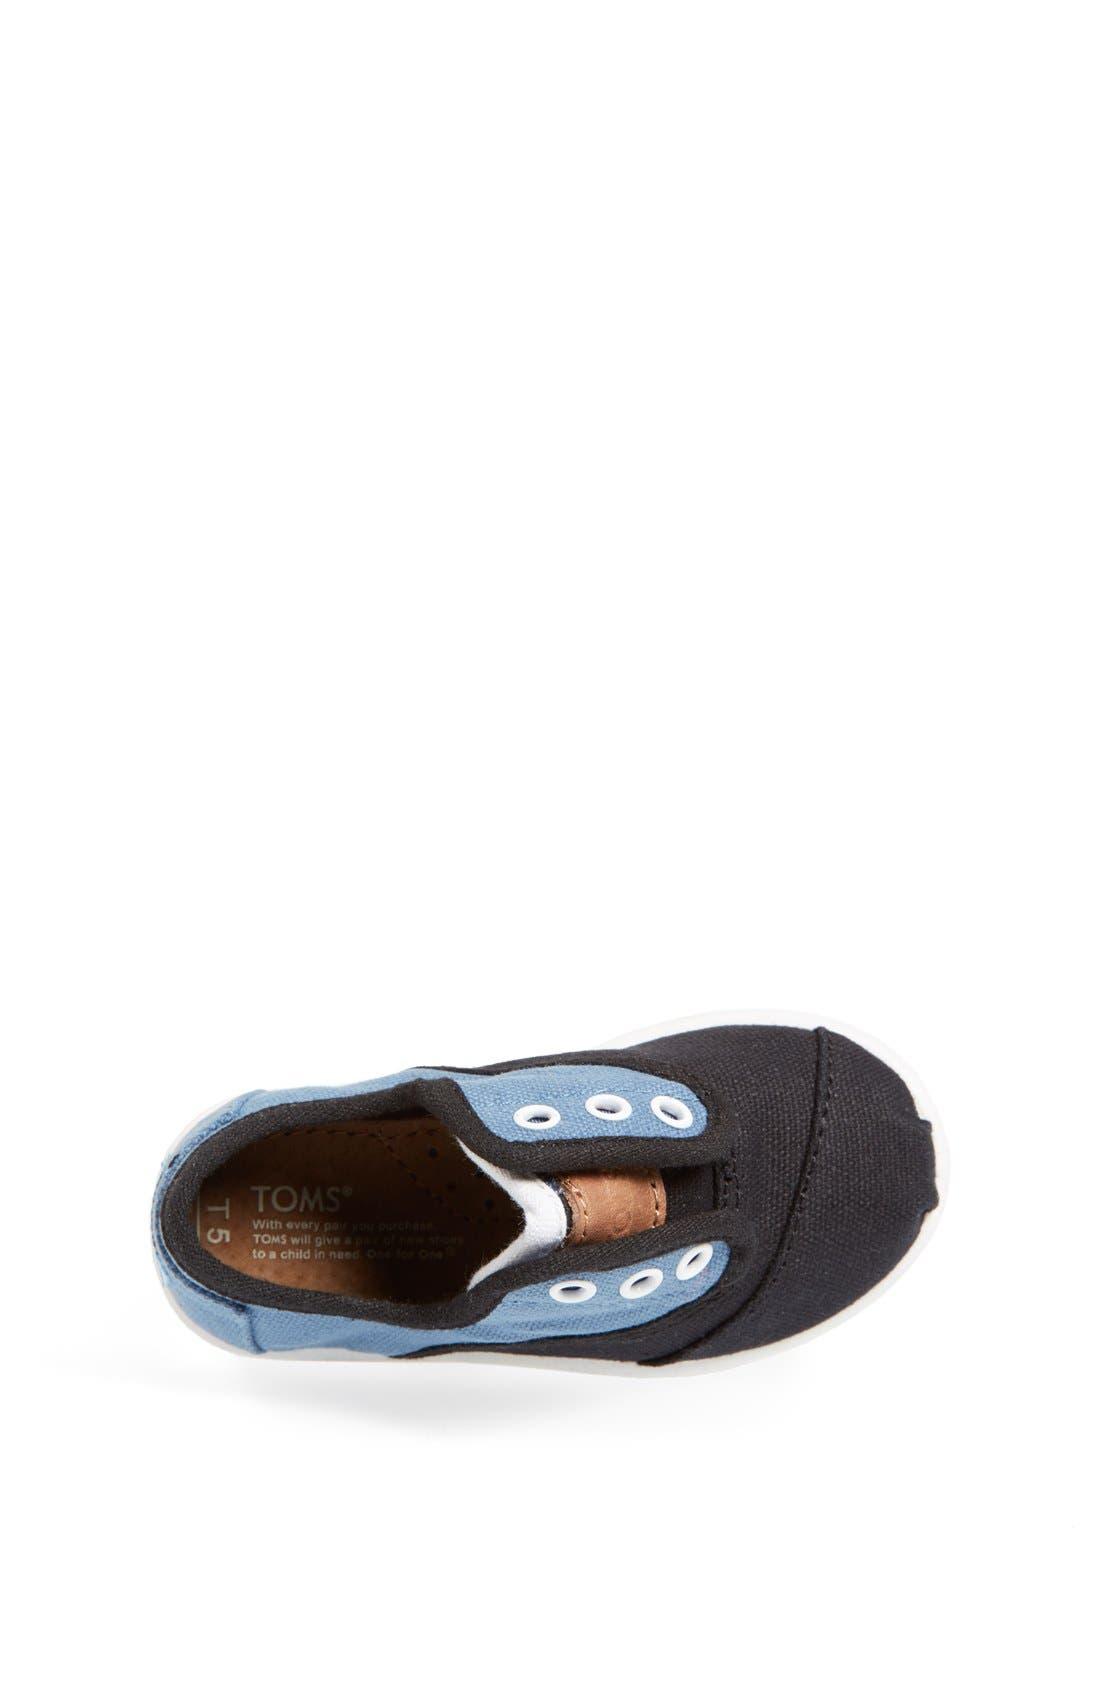 Alternate Image 3  - TOMS 'Cordones - Tiny' Sneaker (Baby, Walker & Toddler)